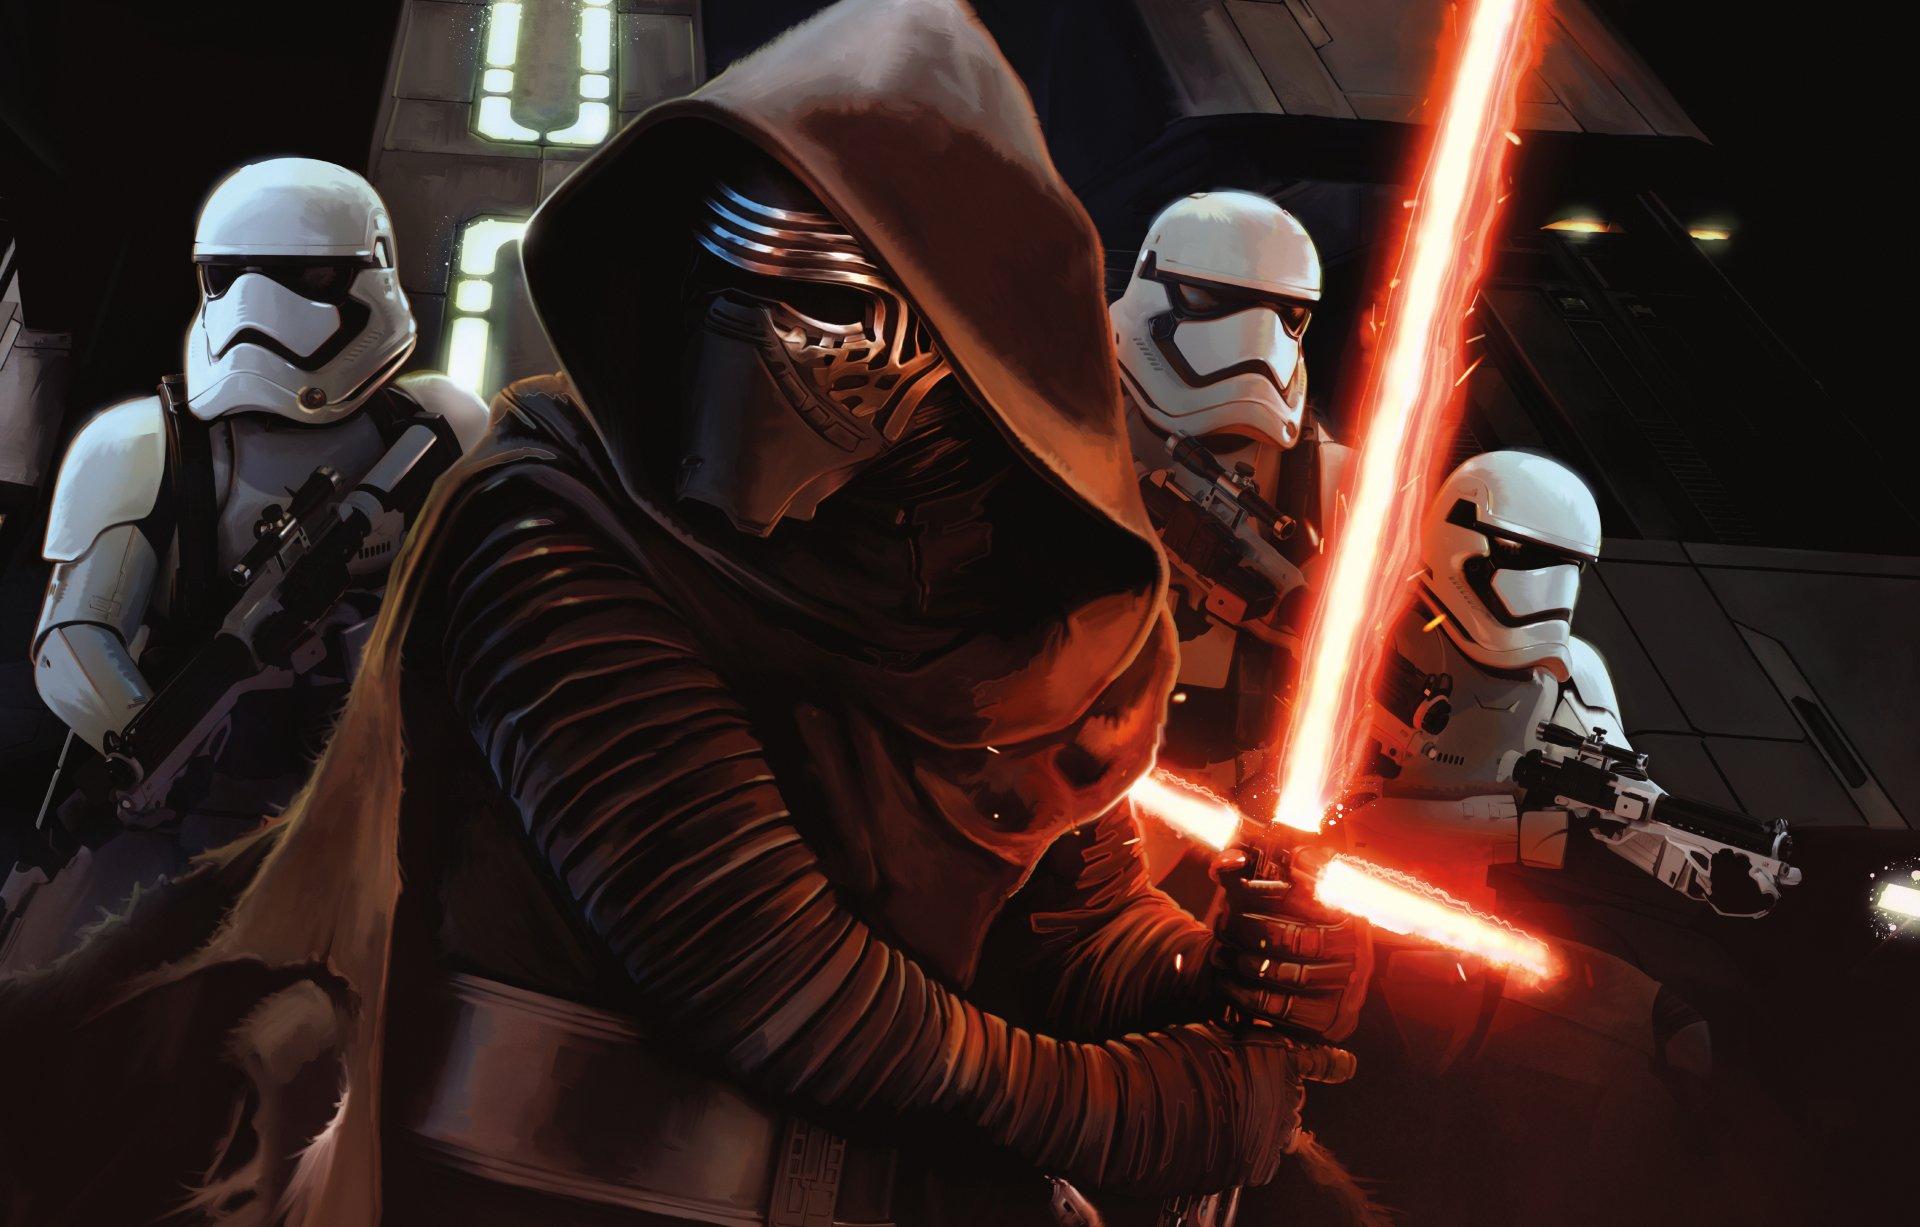 Movie - Star Wars Episode VII: The Force Awakens  Kylo Ren Star Wars Stormtrooper Lightsaber Wallpaper